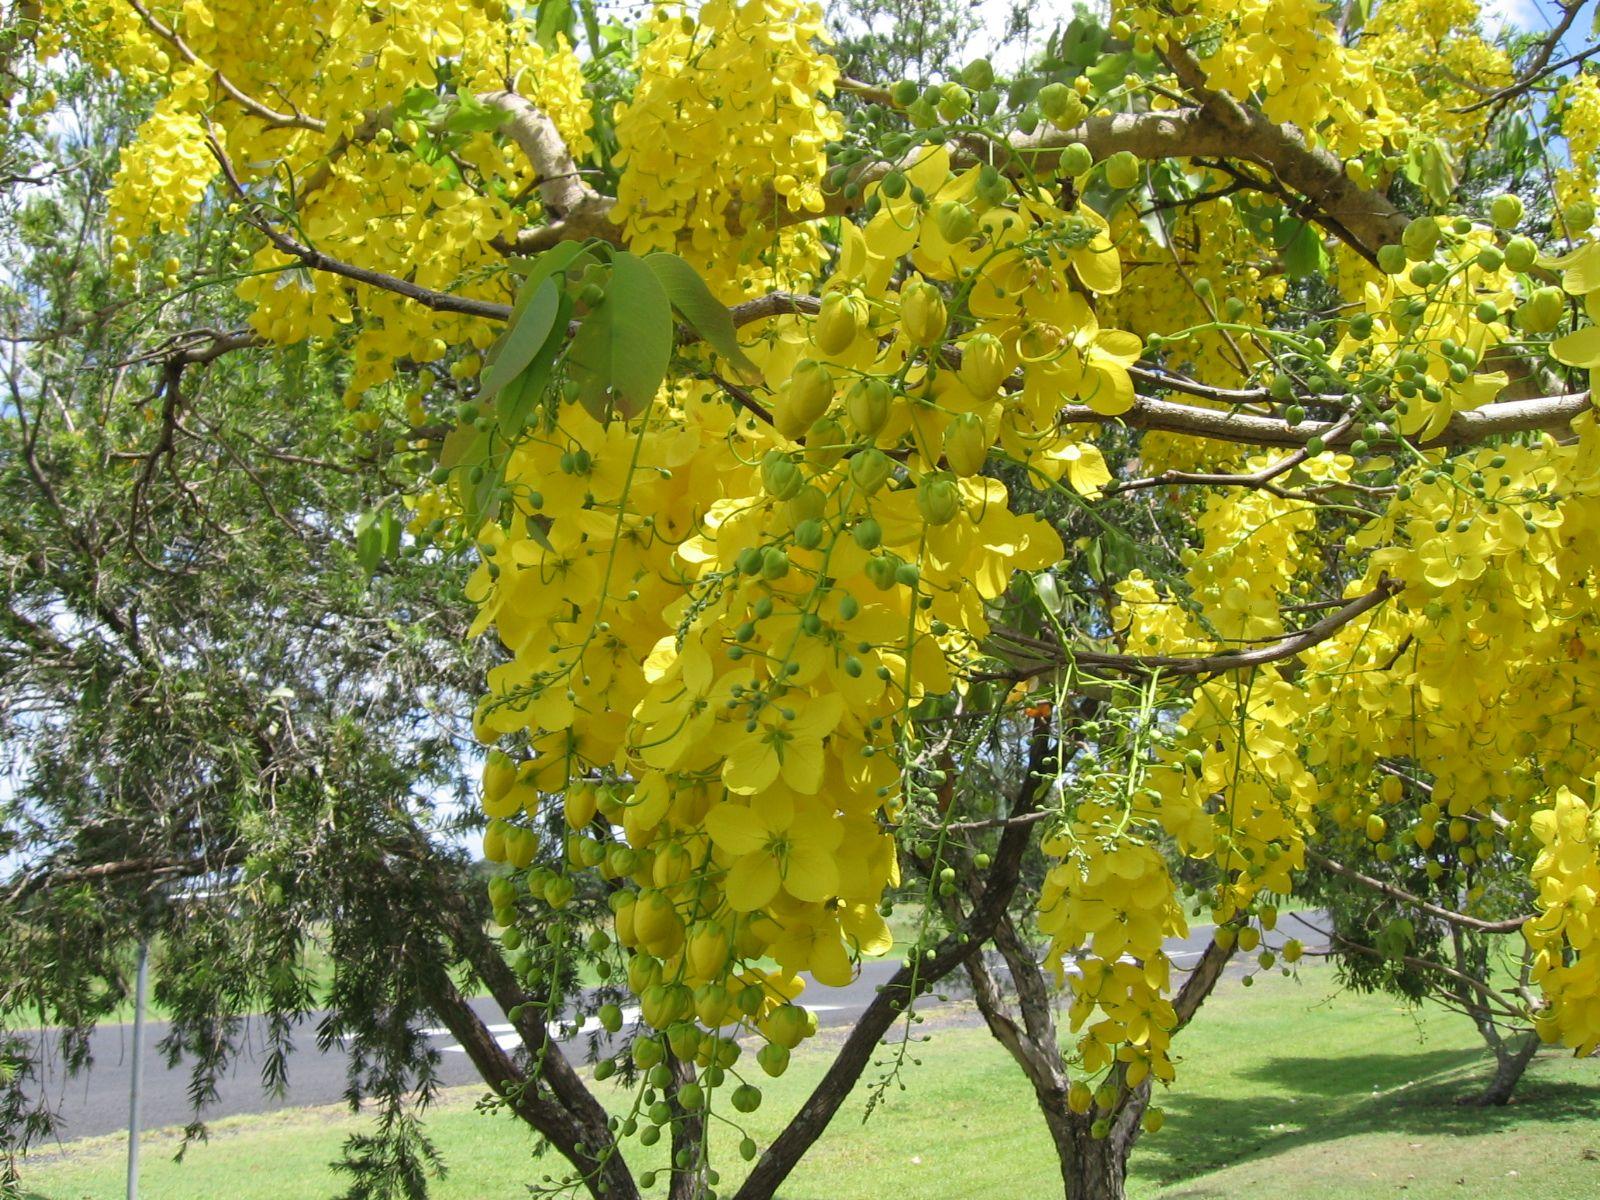 Cassia_fistula flowering trees of india